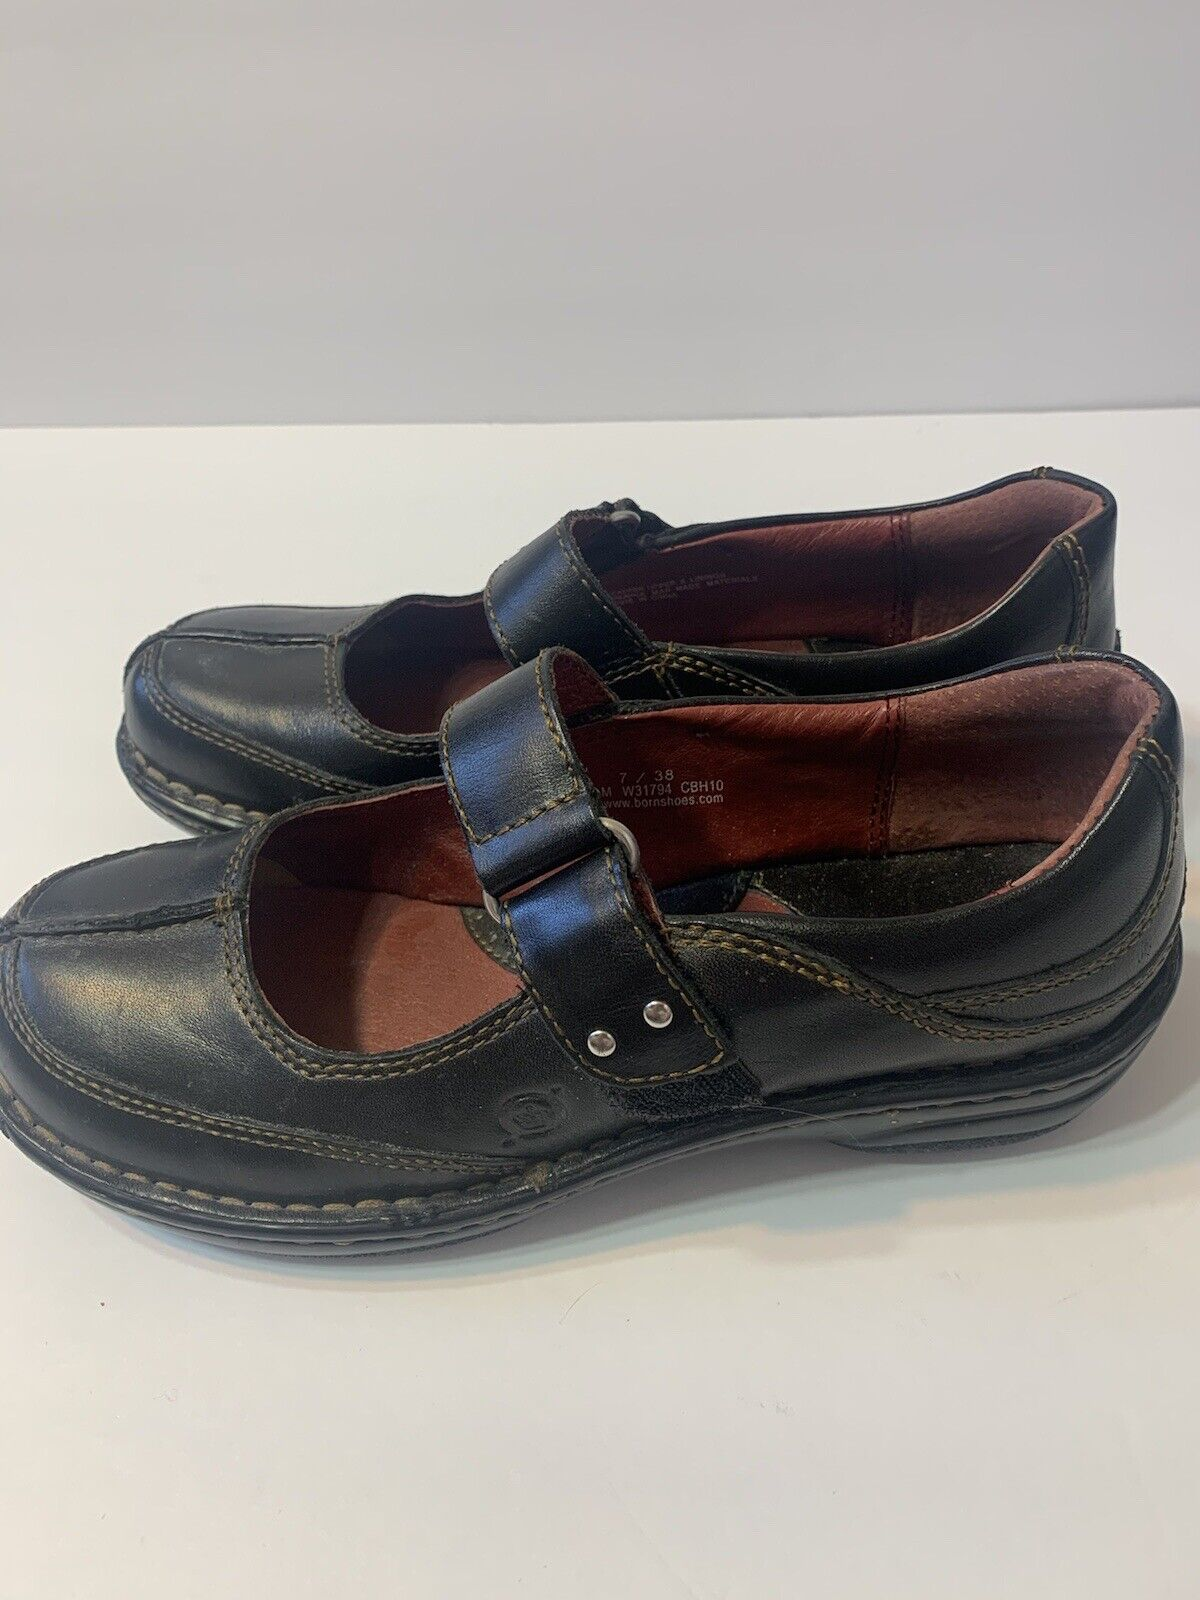 Born Women's Mary Janes Black Leather Comfort Sole w/Adjustable Strap Sz 7M